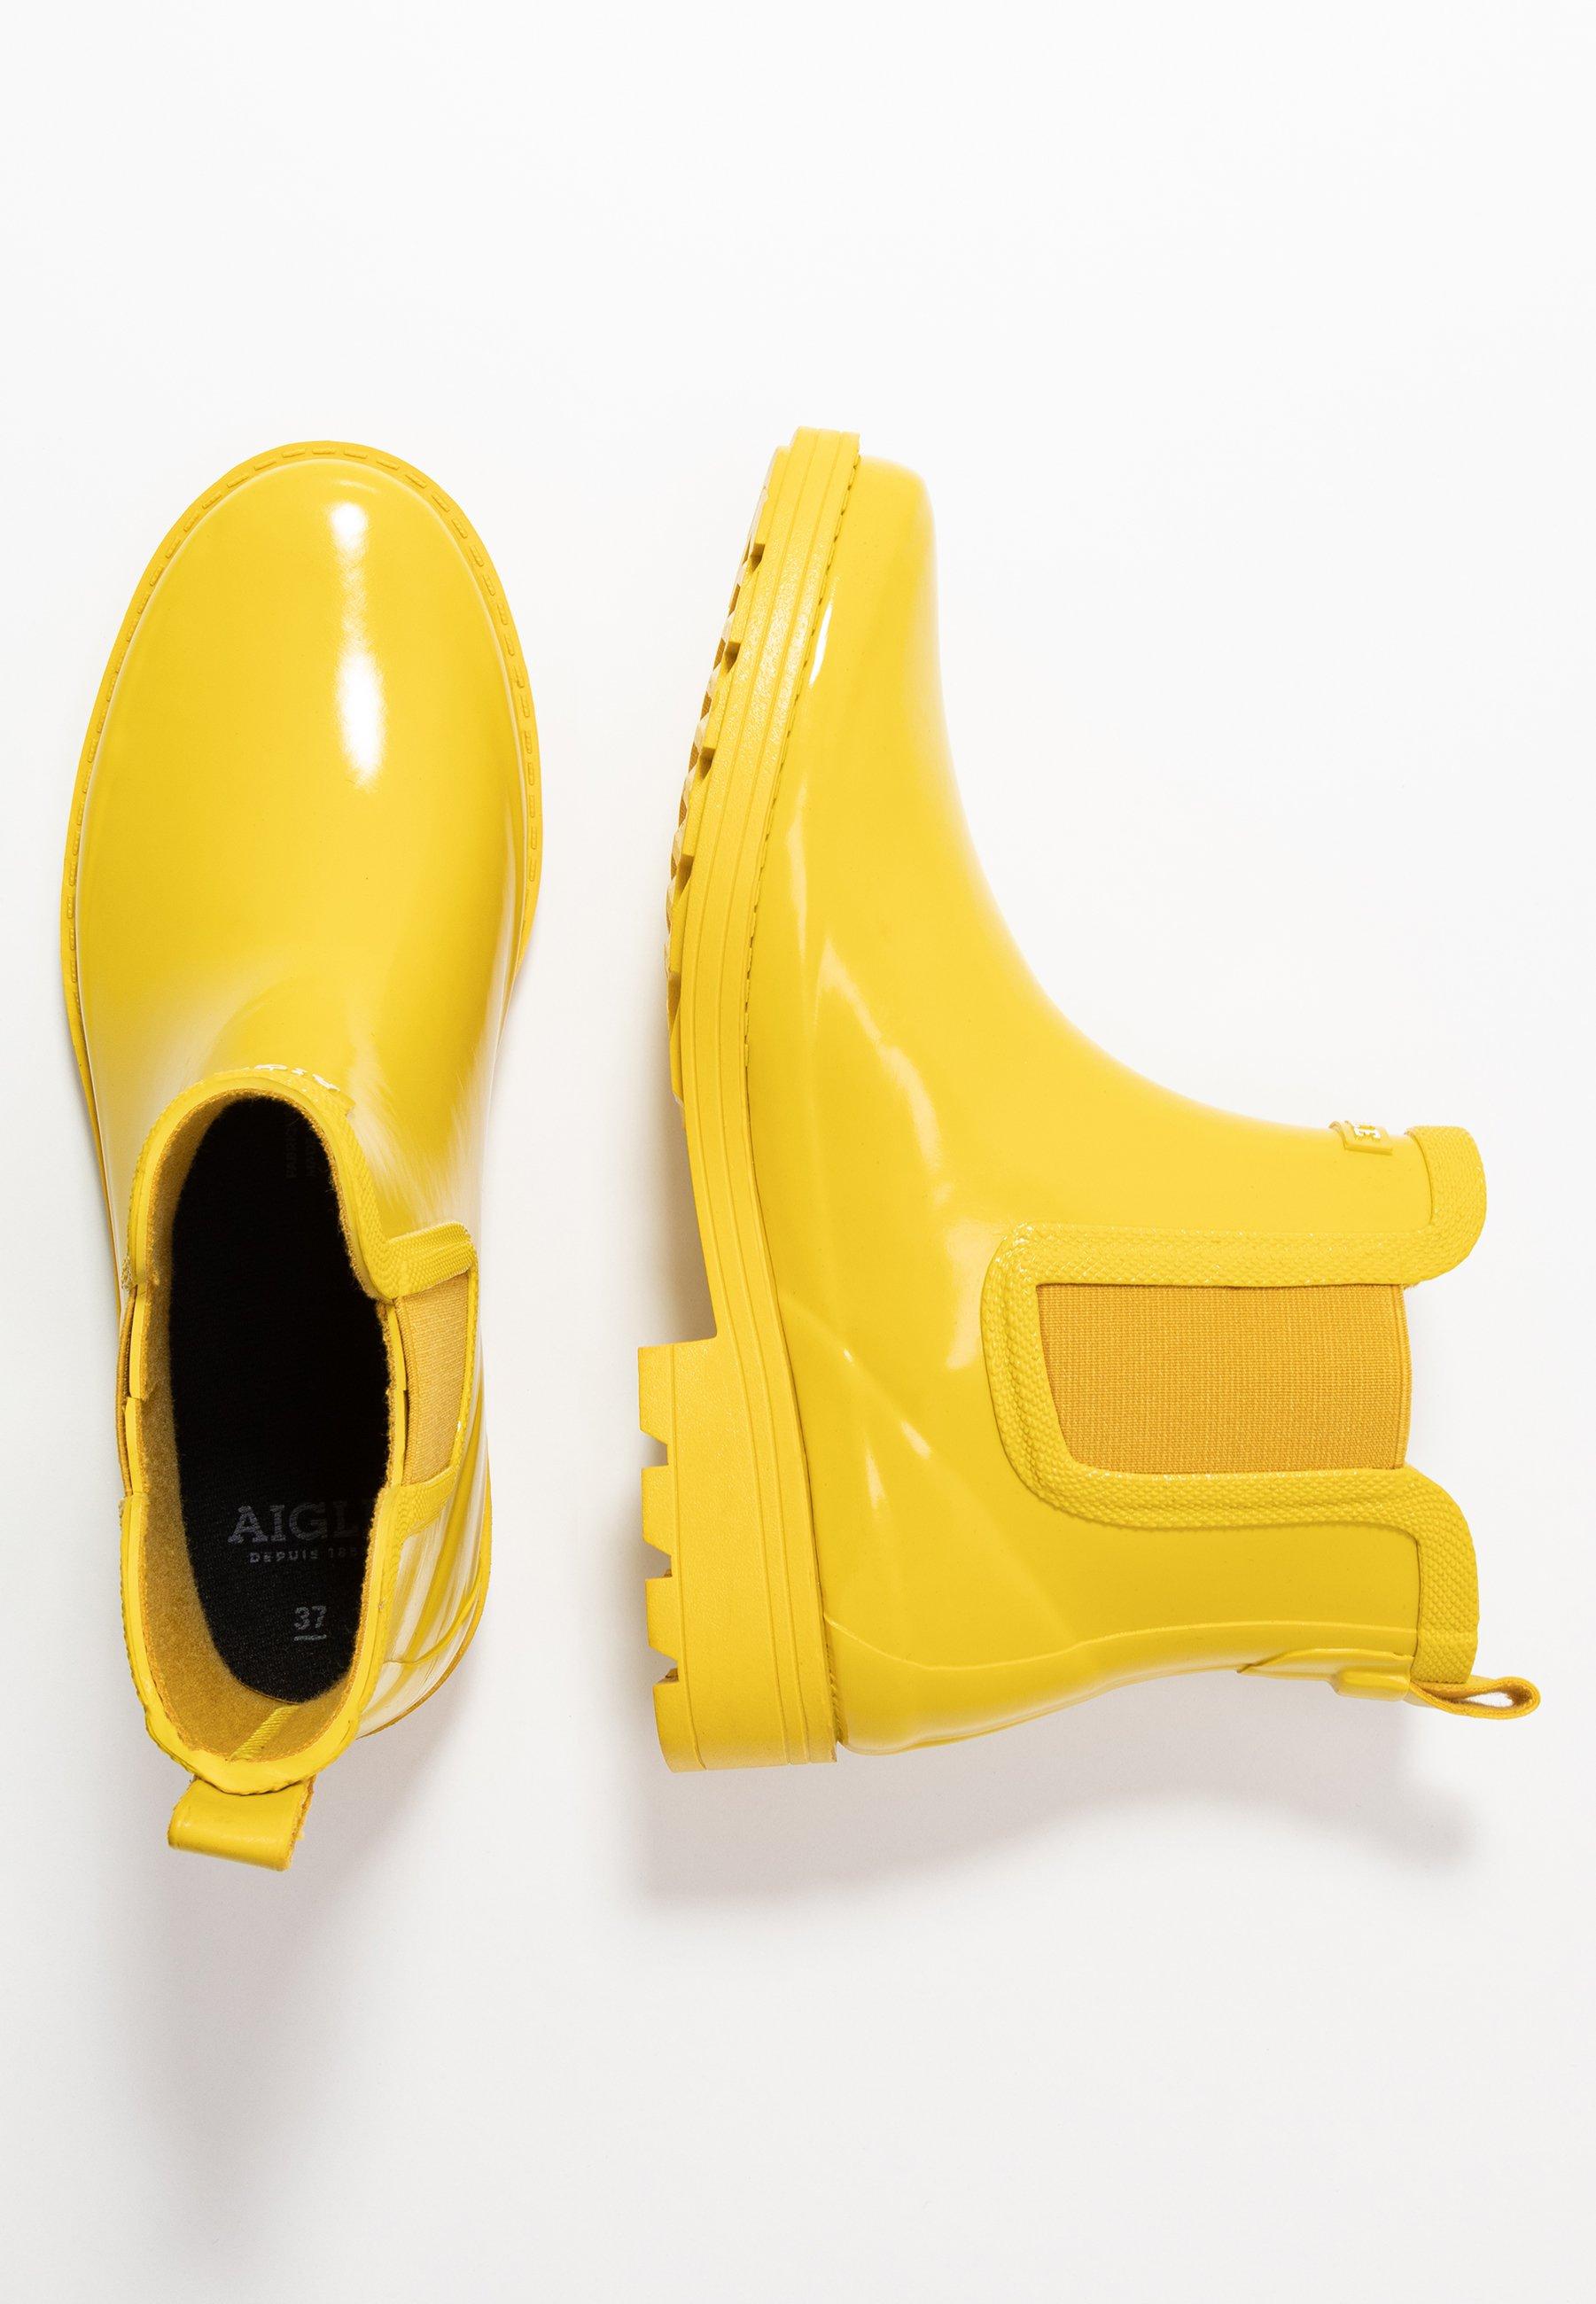 Aigle Carville Laarzen Dames Geel 37 Regenlaarzen Shoes